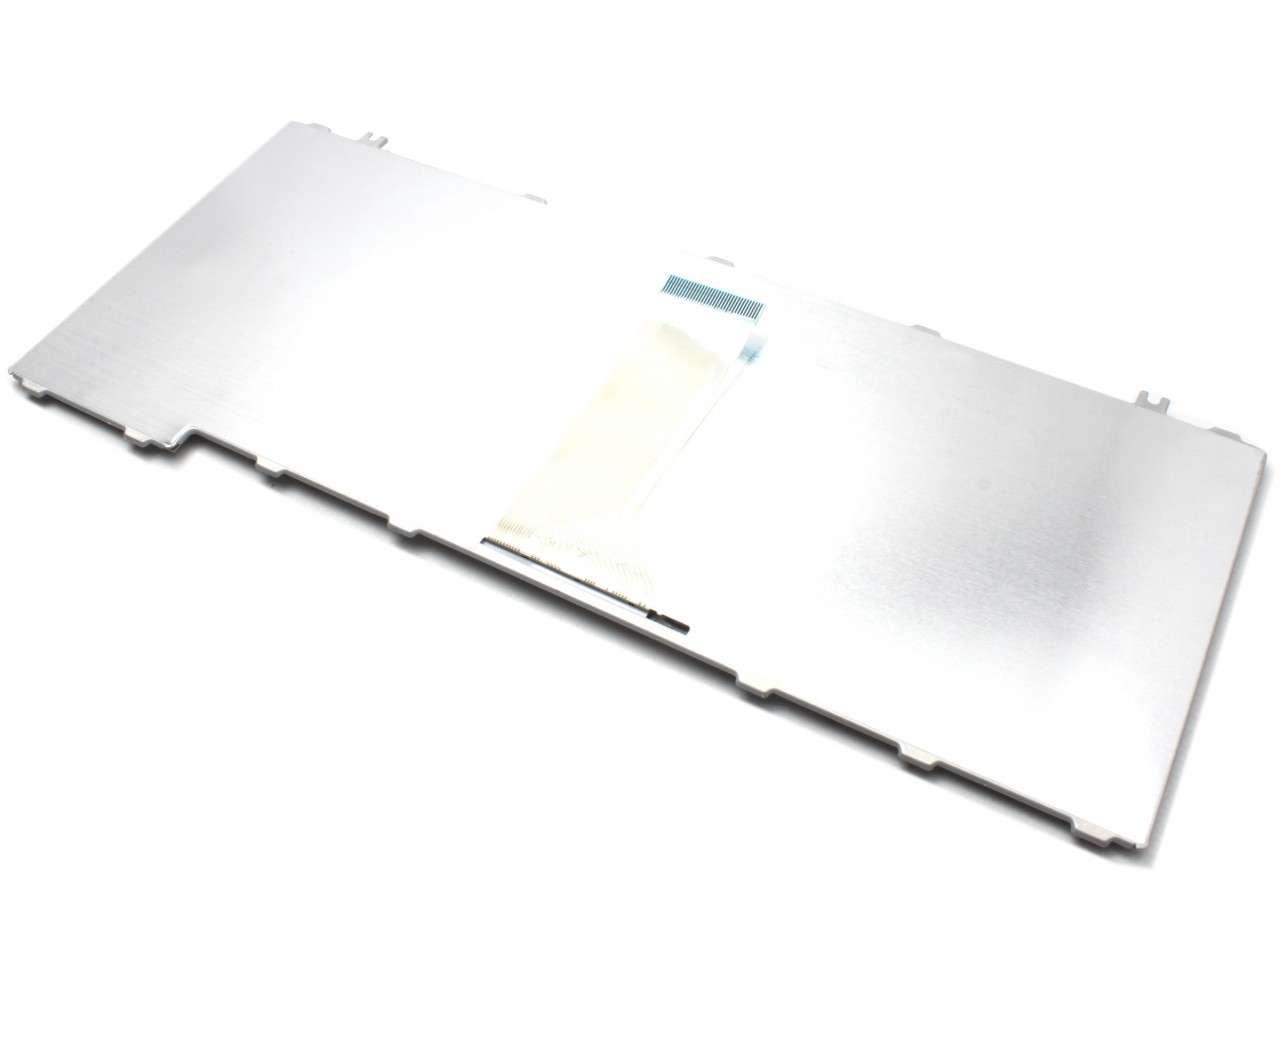 Tastatura Toshiba Satellite L201 Alba imagine powerlaptop.ro 2021